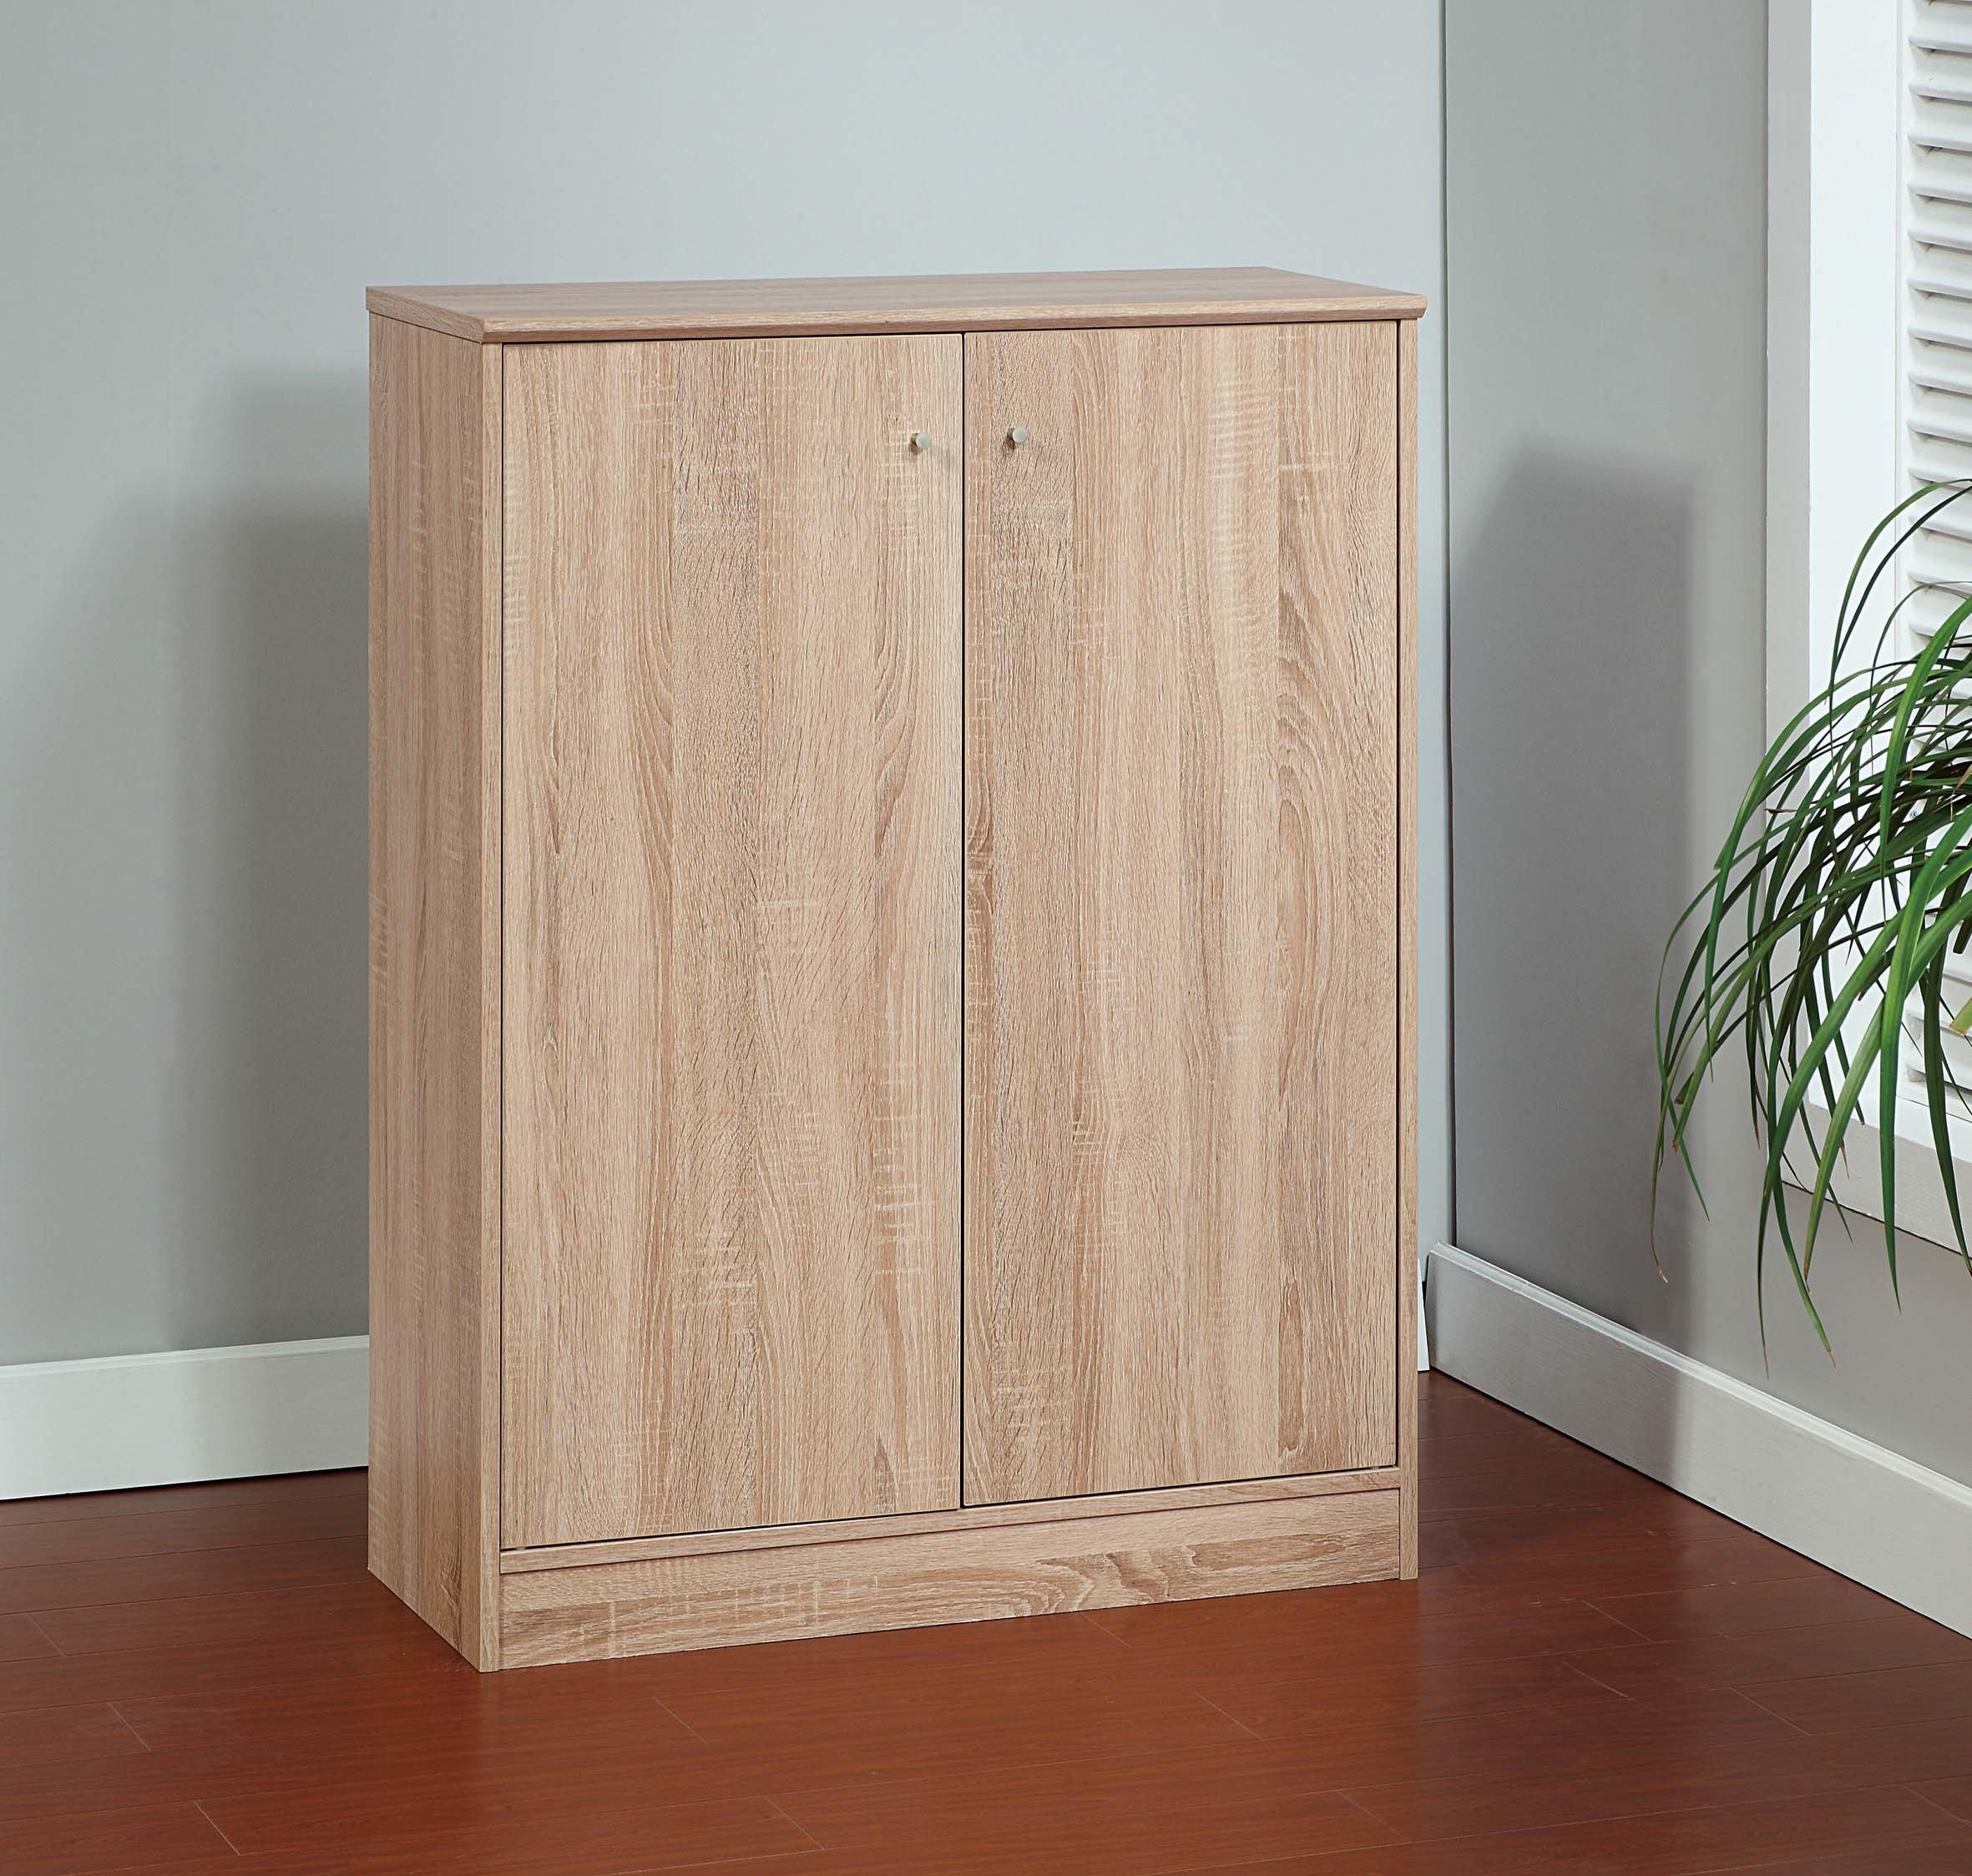 Smart Home 5 Tier 5 Shelves Shoe Cabinet Closet Organizer (Weathered White)